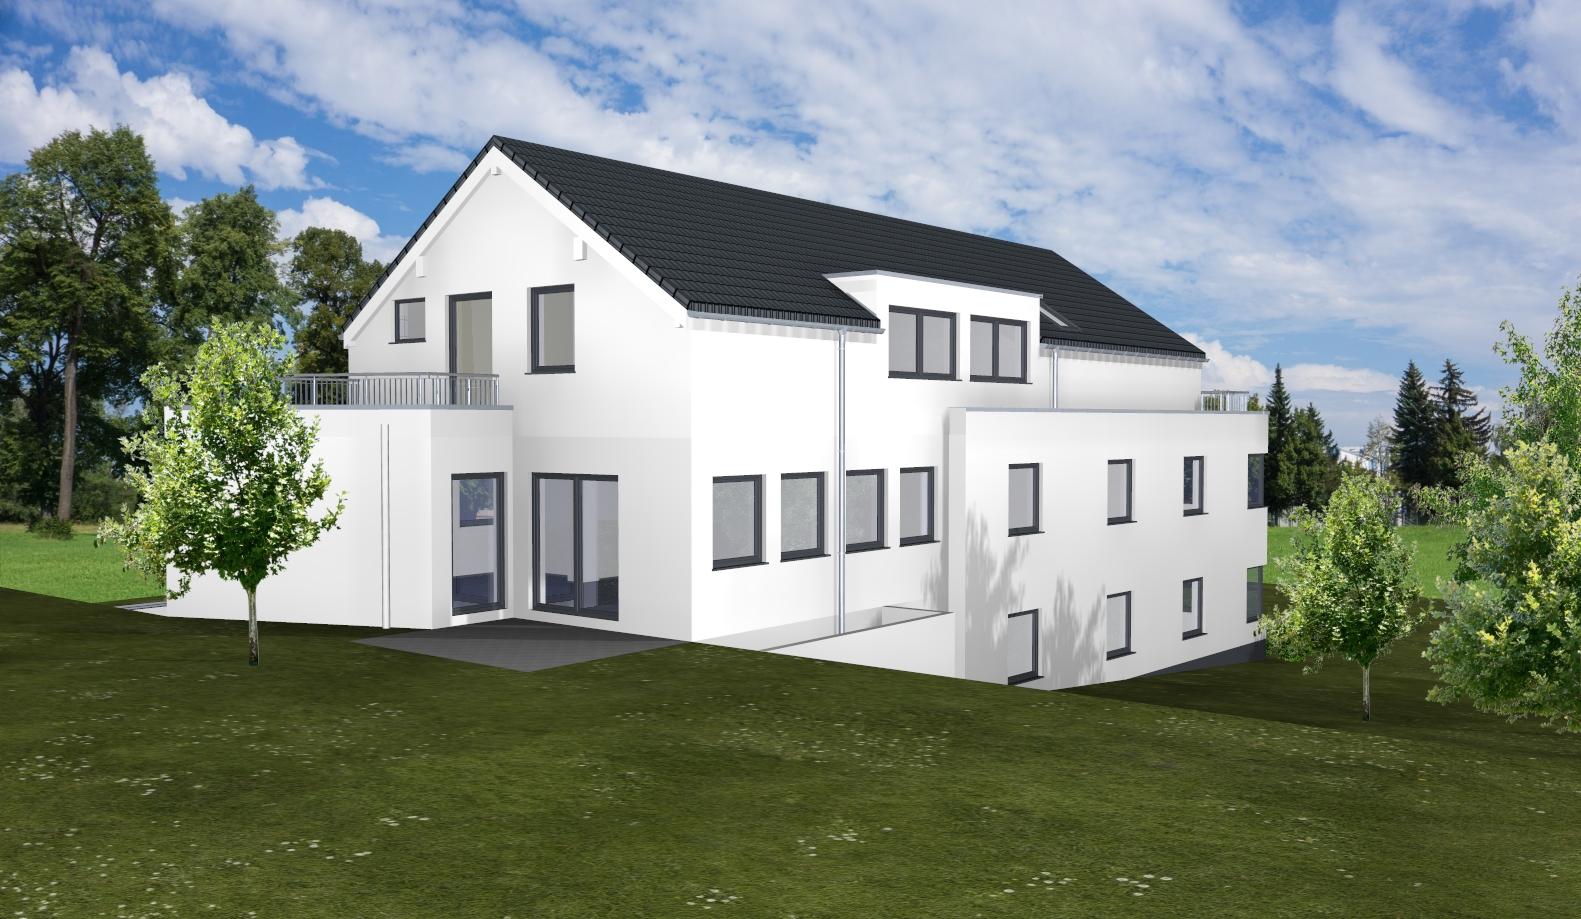 Mehrfamilienhaus | www.artos-haus.de